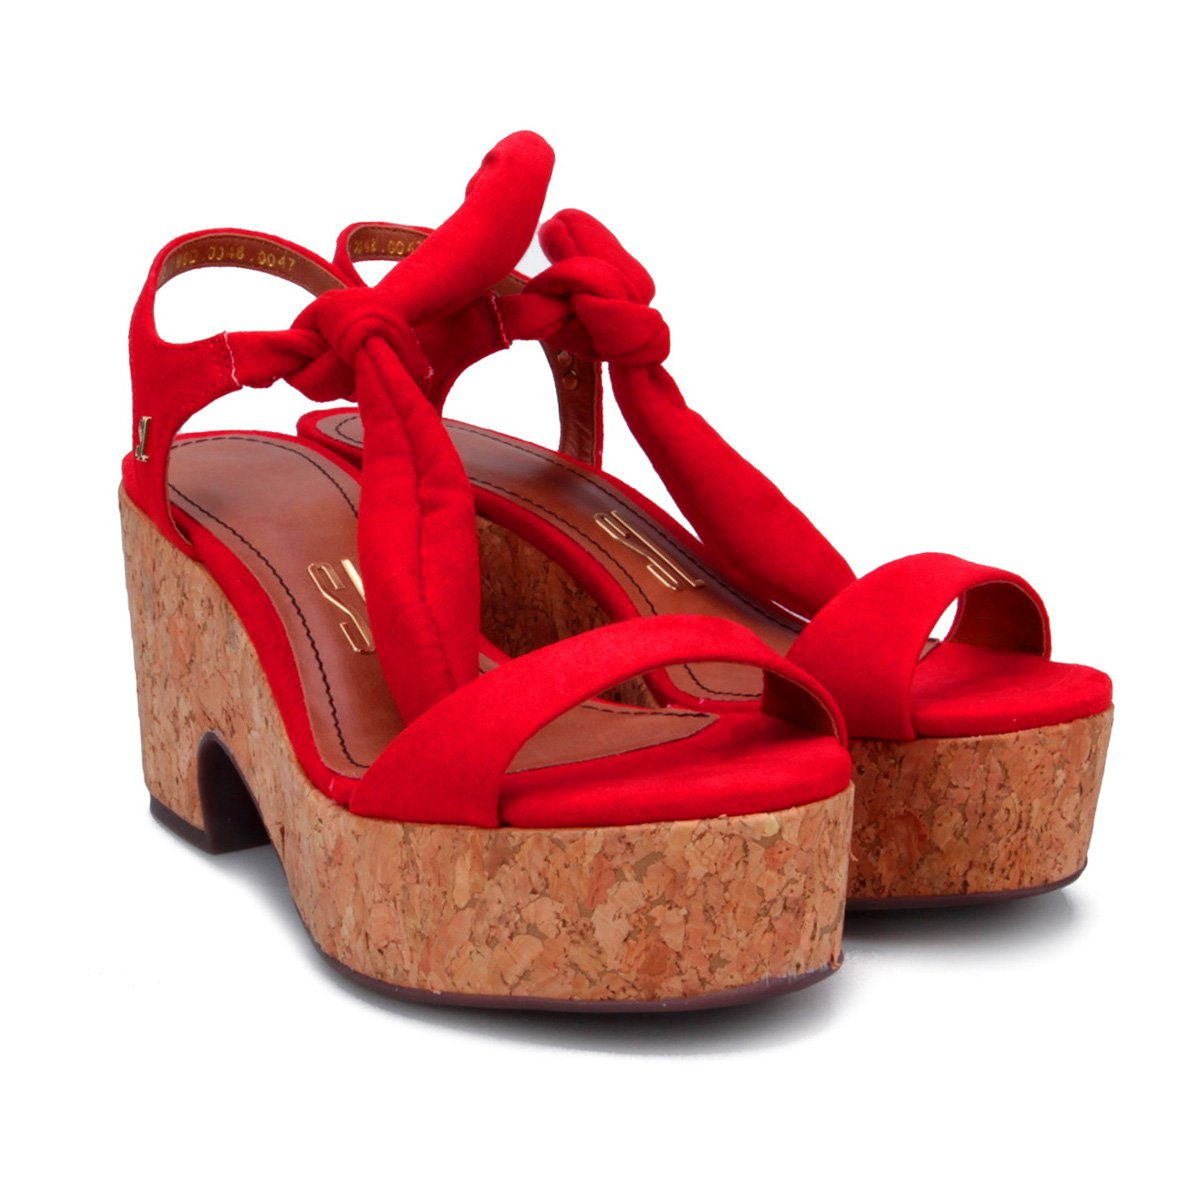 Vermelho Feminina Cortiça Santa Plataforma Sandália Plataforma Amarração Lolla Sandália w08qPyx6C